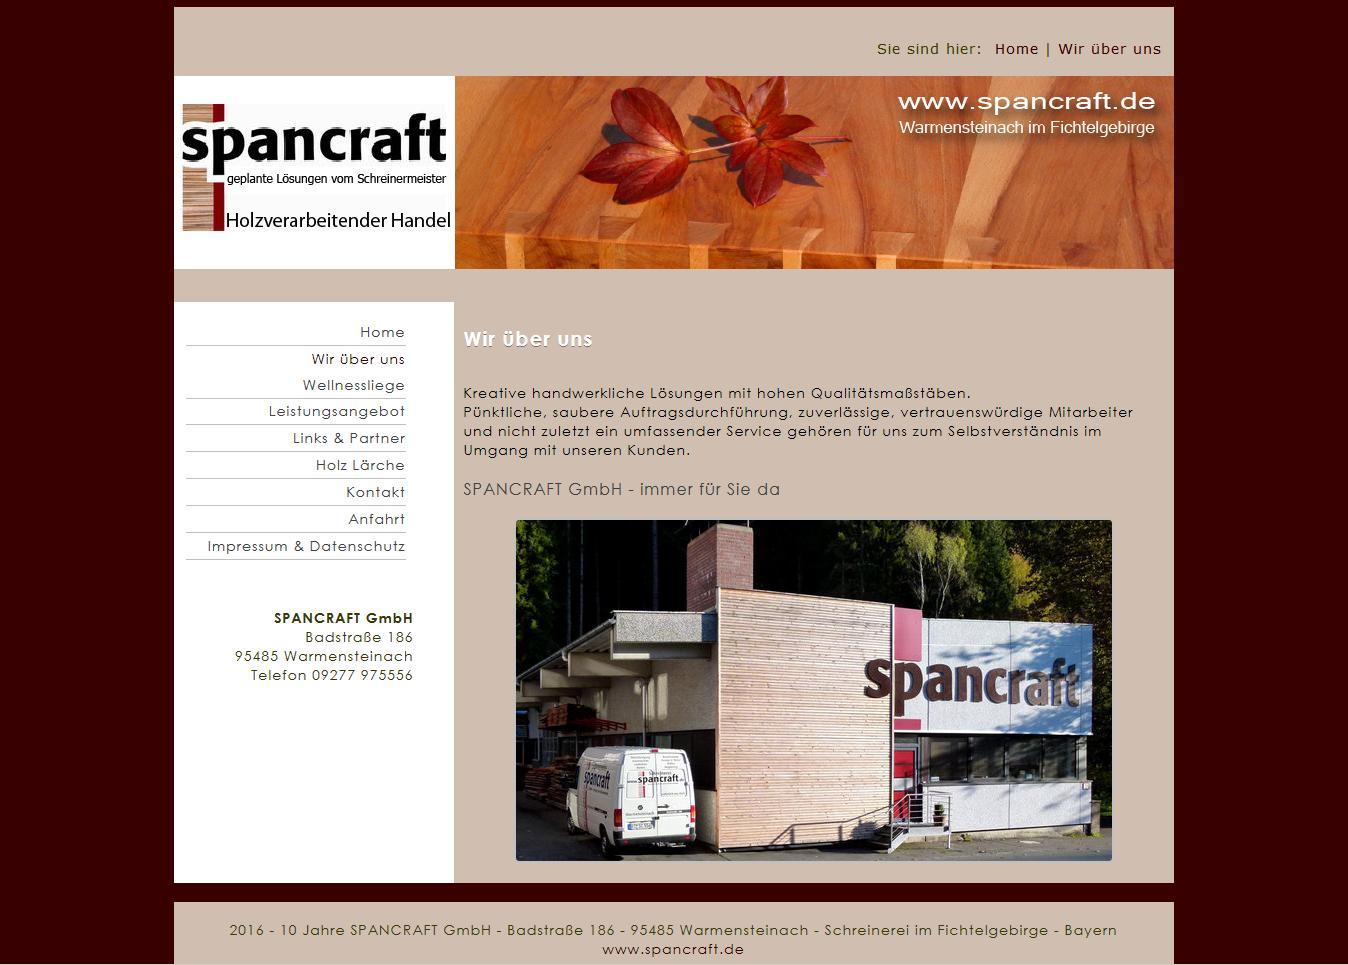 Spancraft GmbH